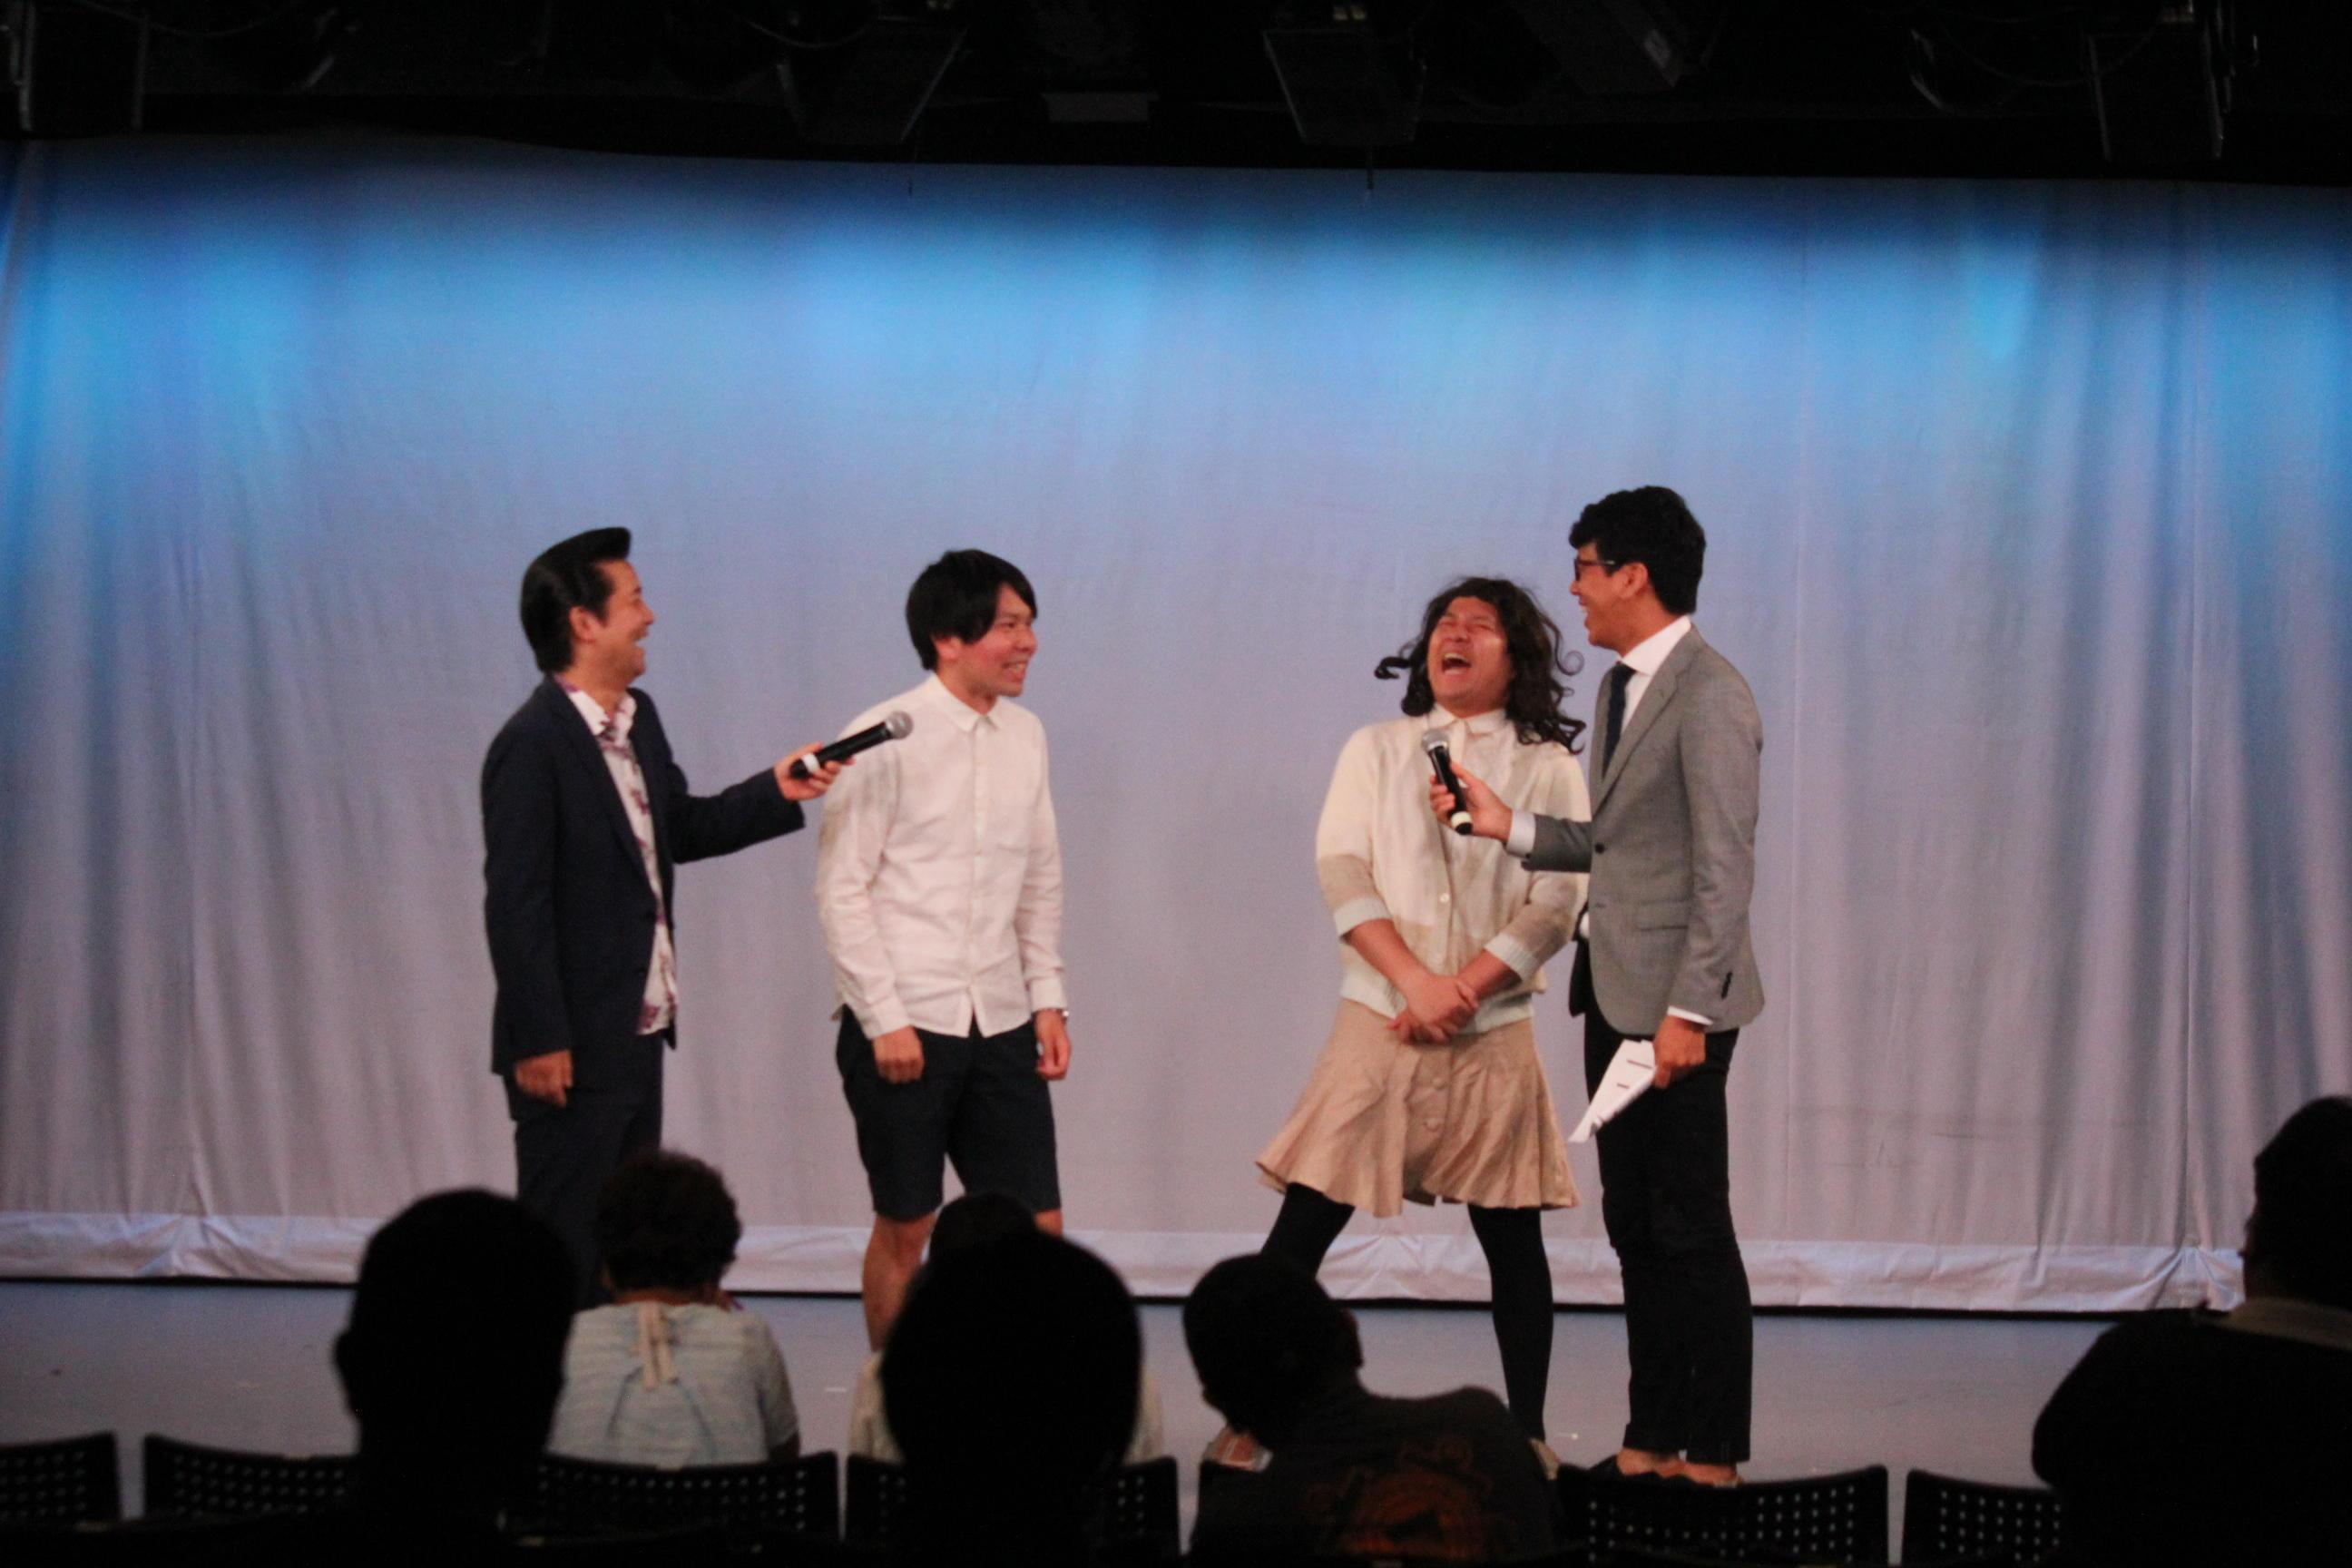 http://news.yoshimoto.co.jp/20160627170511-c3d0d82fbda8572af3a3e9cbb19696ac7c93e422.jpg